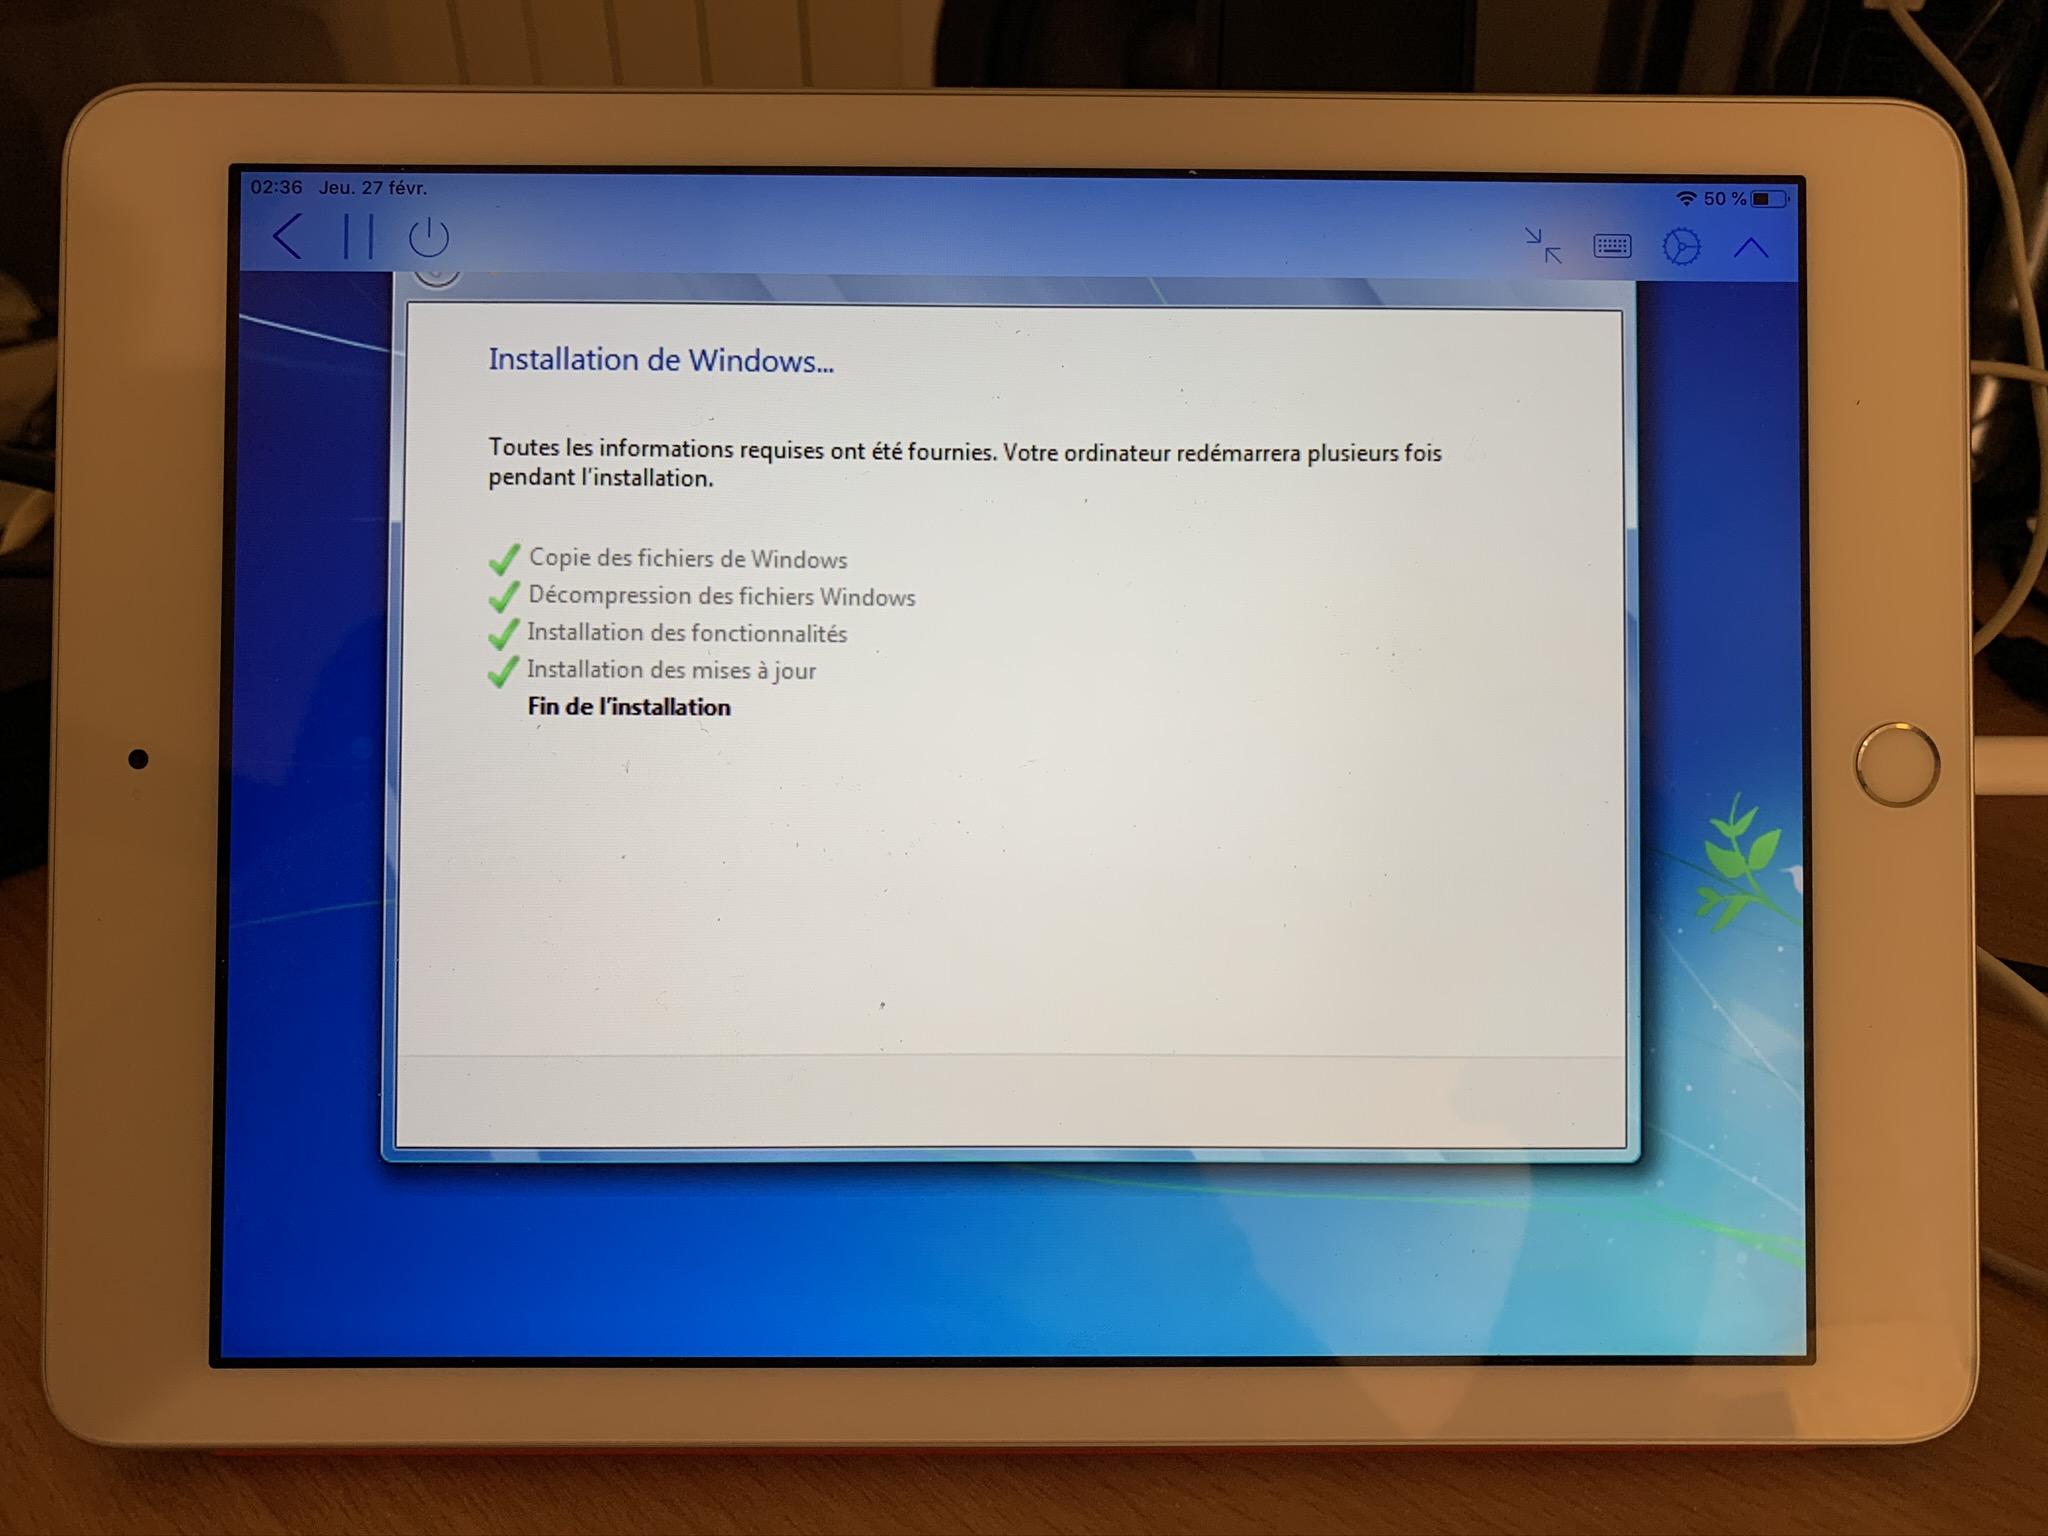 Windows+7+VM+iPad.jpeg?v=d305a9d3aadf044